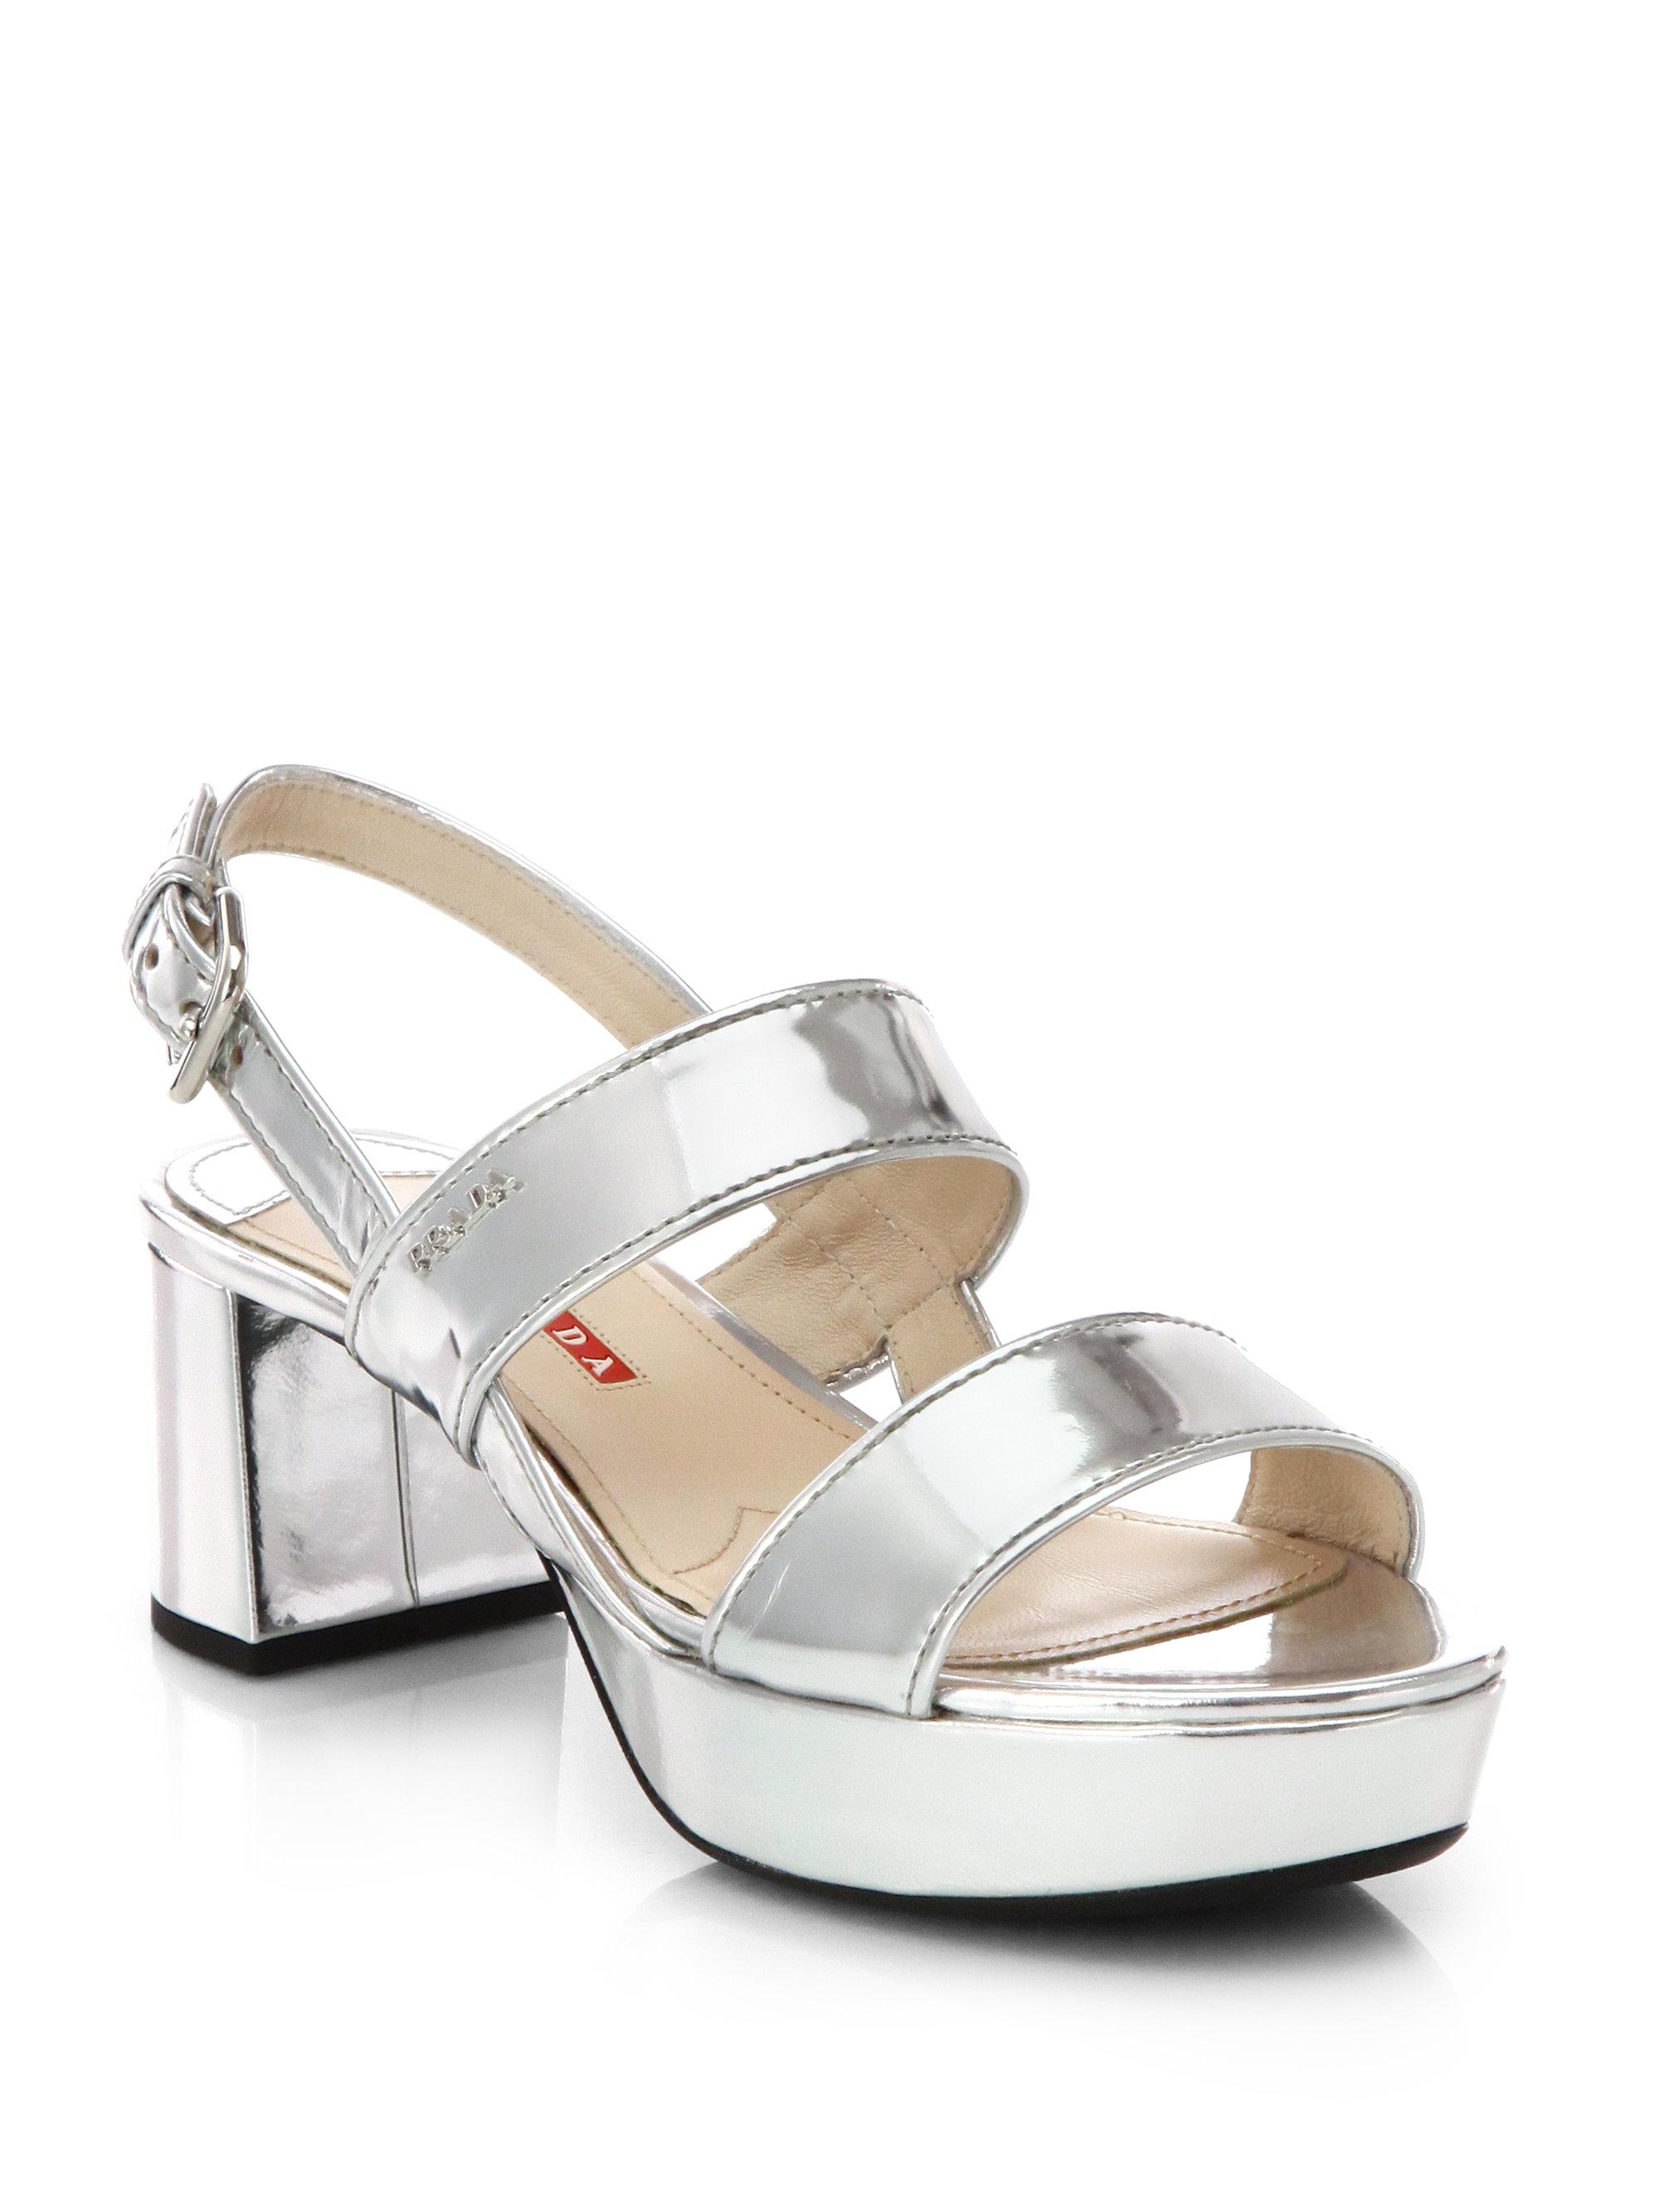 Prada Patent Leather Metallic Sandals shopping online high quality 0LBbWnvcT6